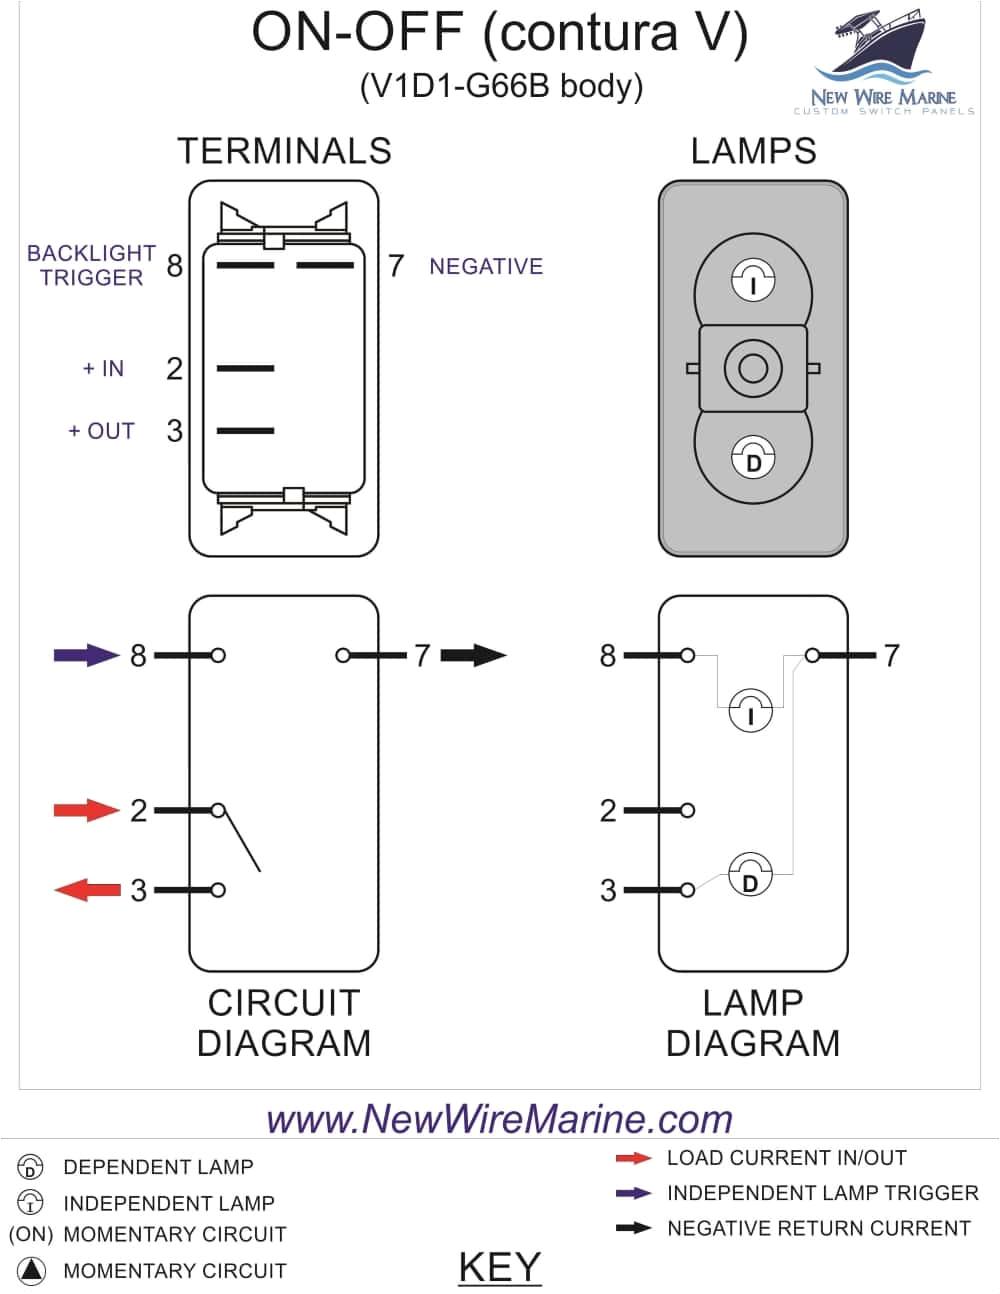 rocker switch wiring diagrams new wire marine powertech dual illuminated spdt rocker switch wiring on off